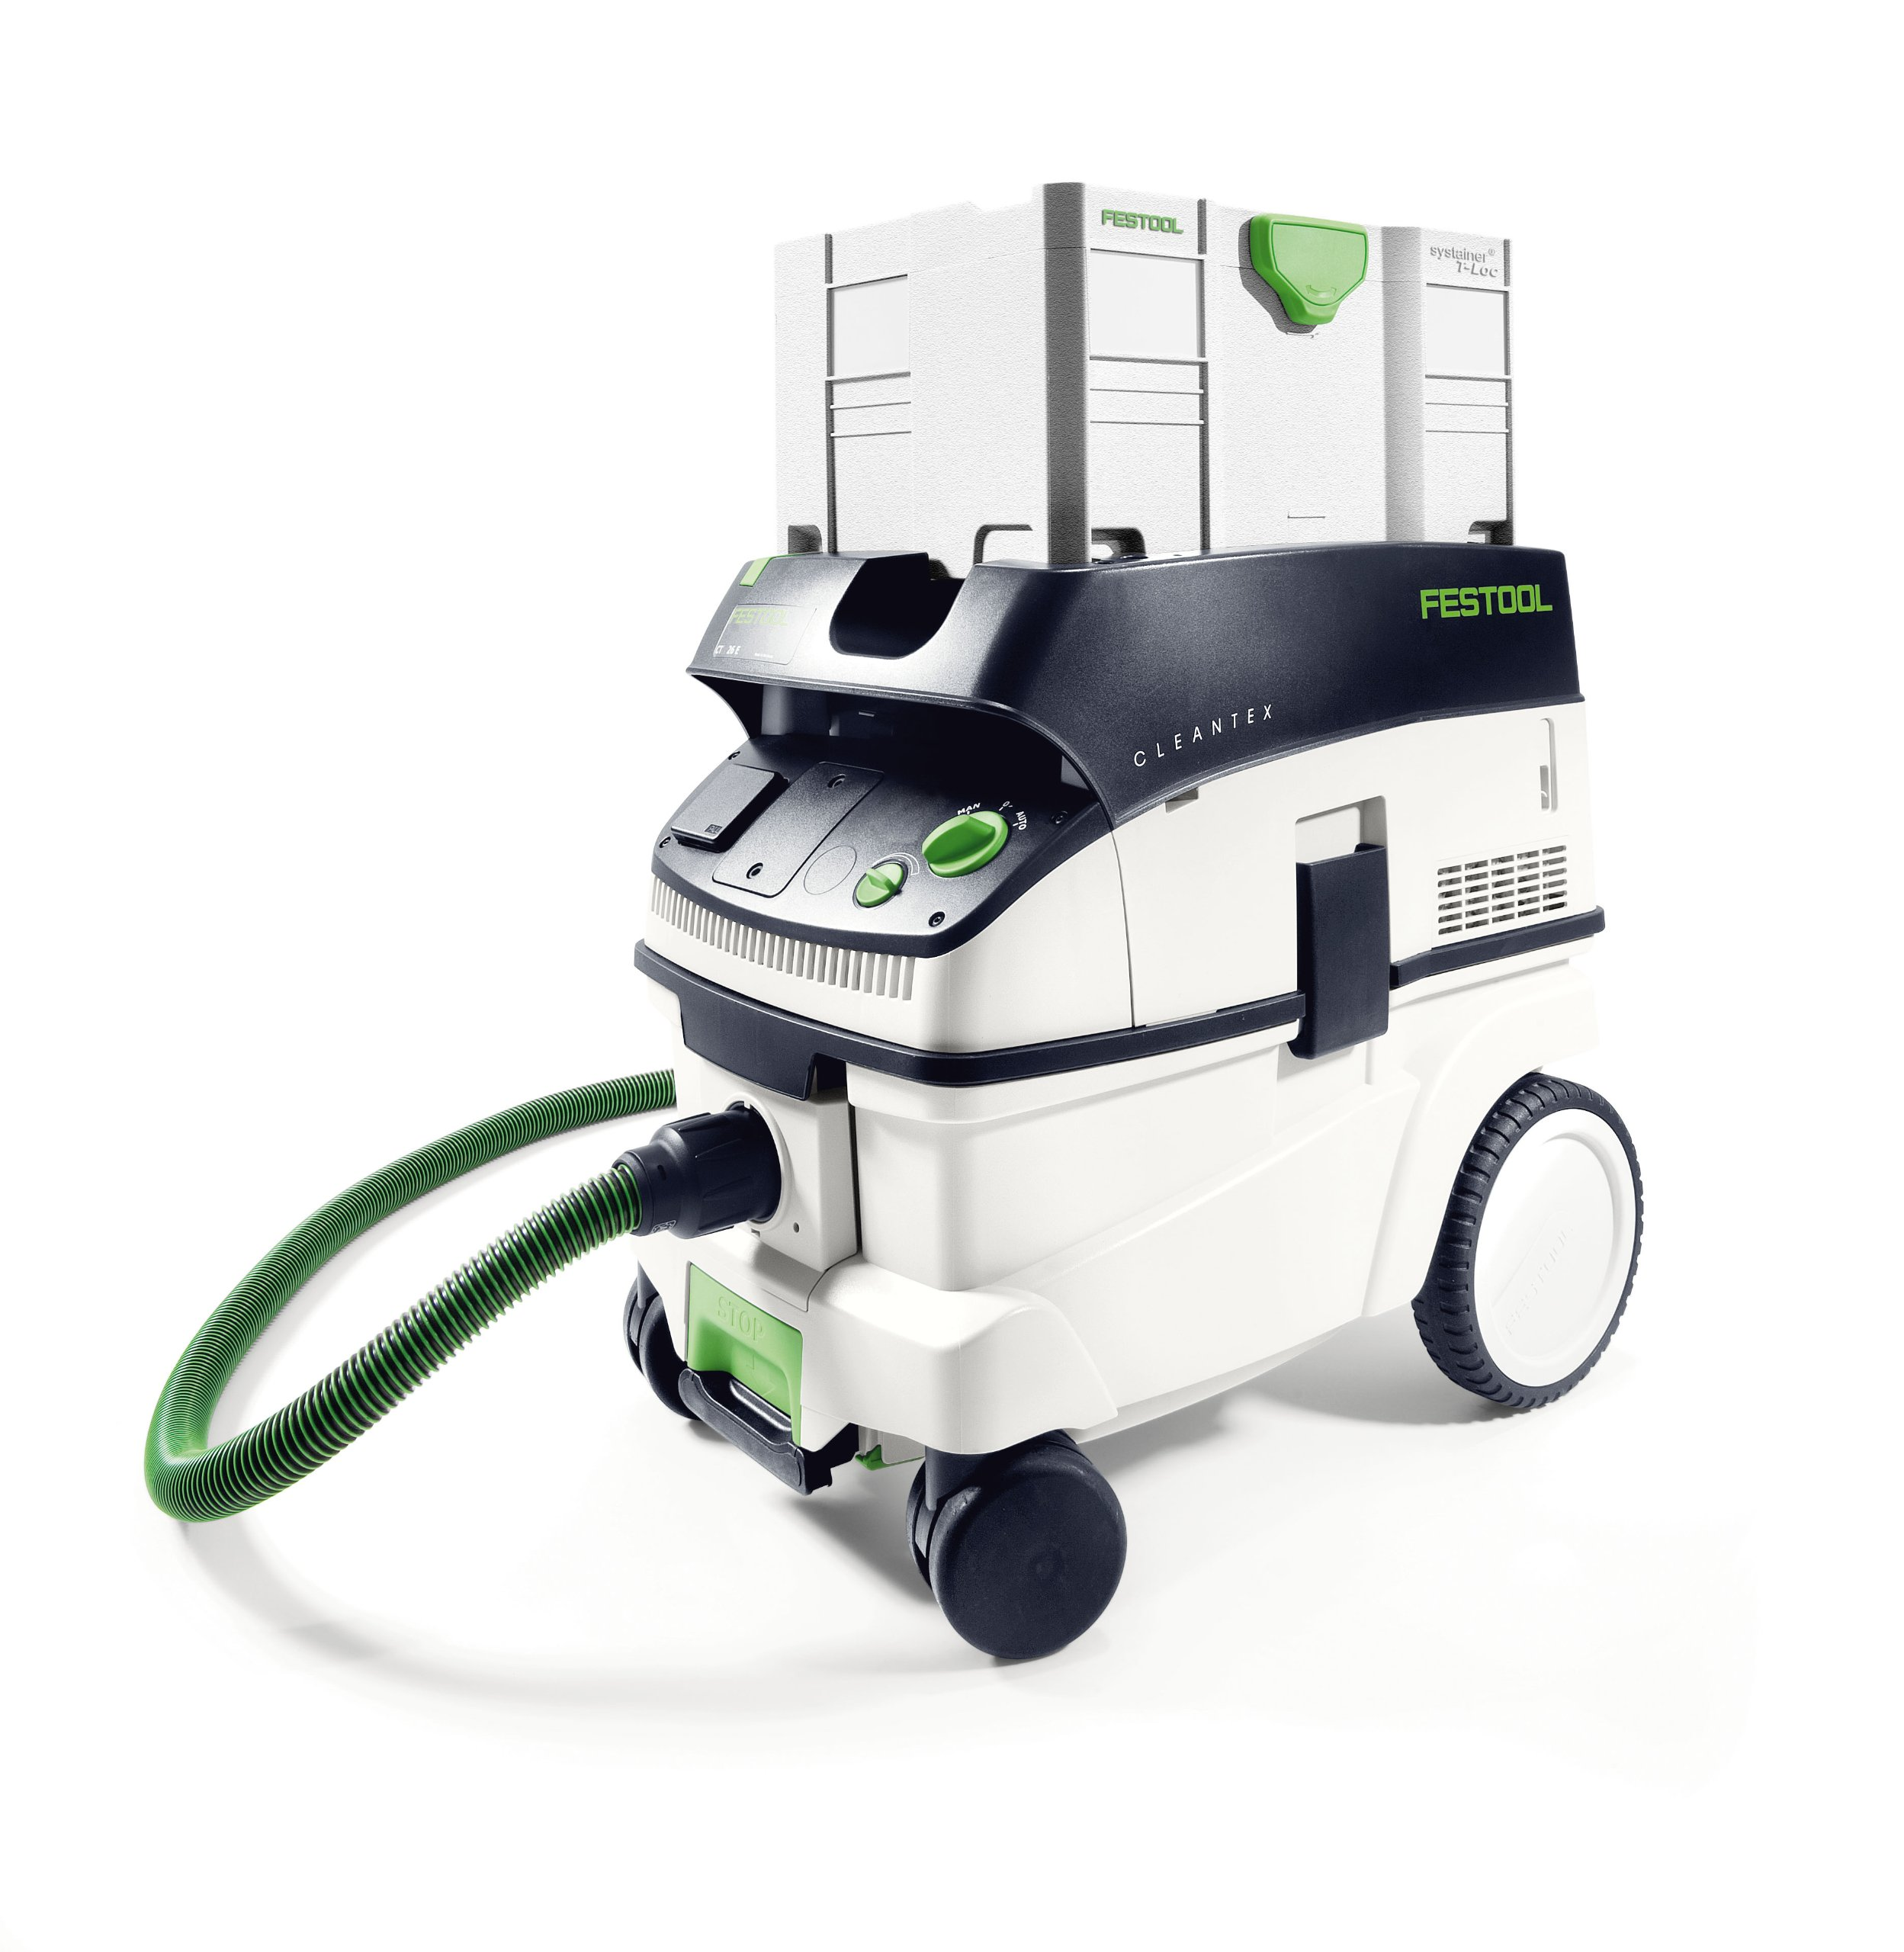 Festool 583492 CT 26 E Dust Extractor